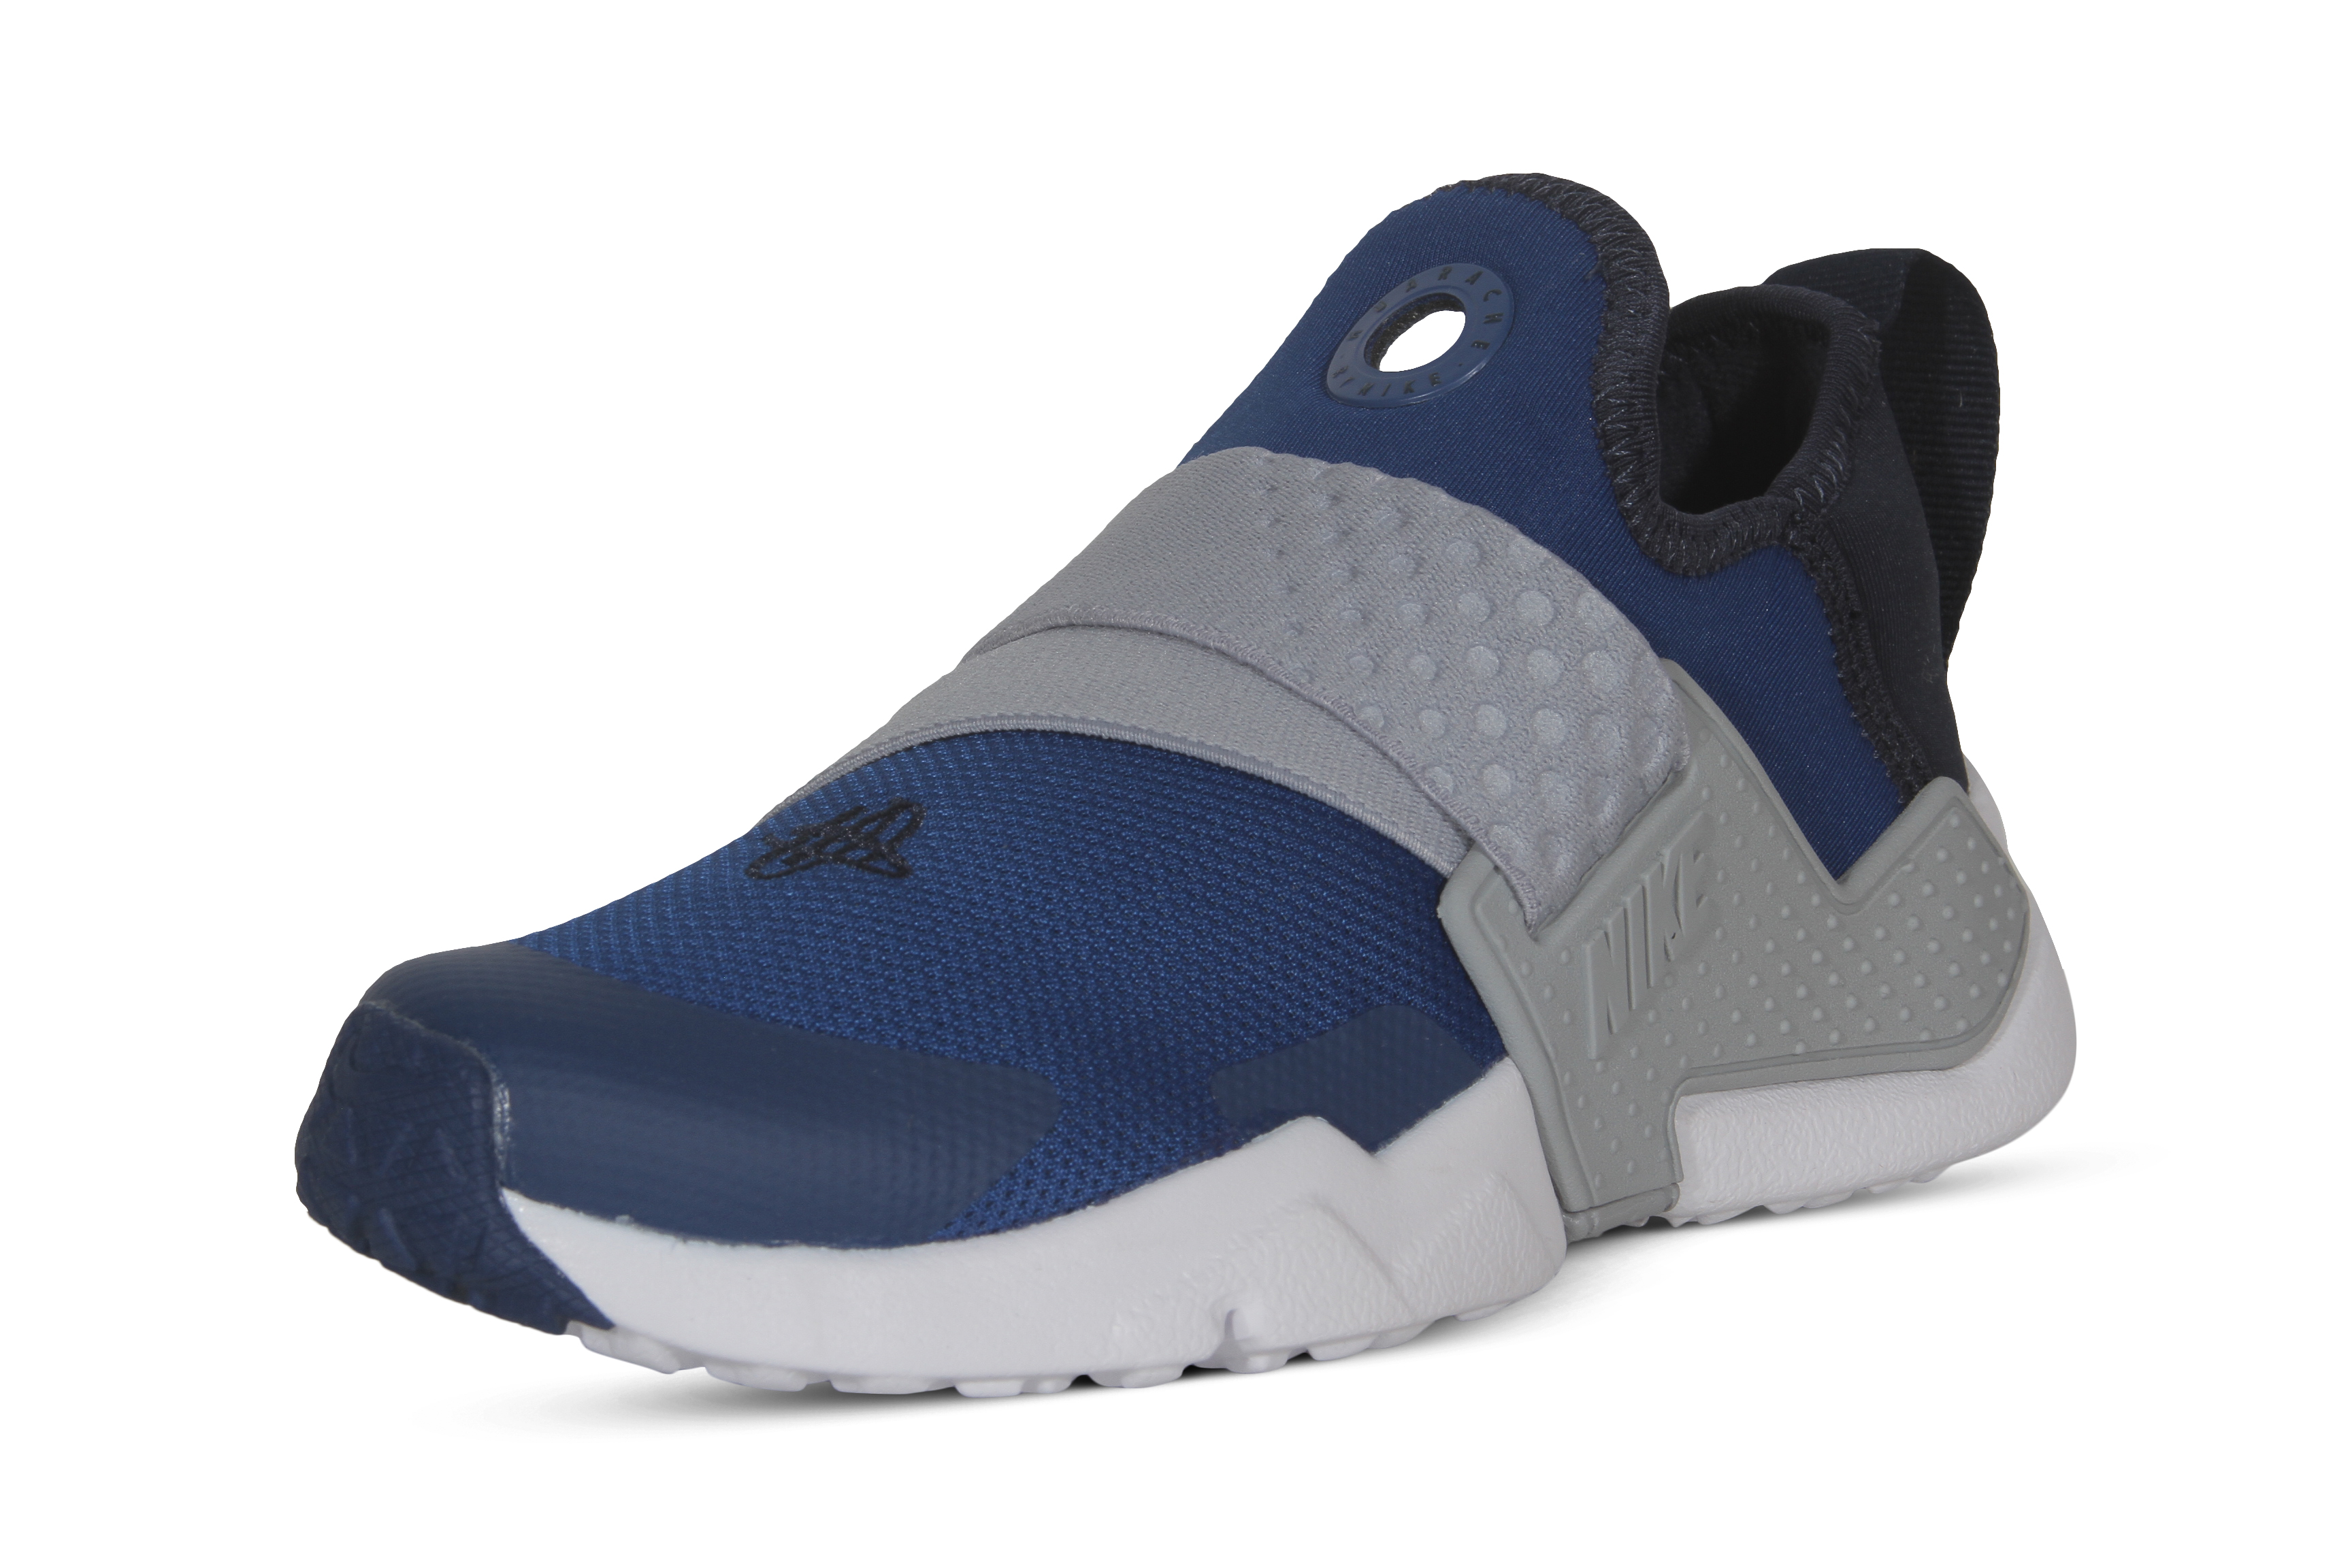 a6612582a9e1c Nike Huarache Extreme (PS) Boys  Pre-School Running Shoes AH7826-401 ...